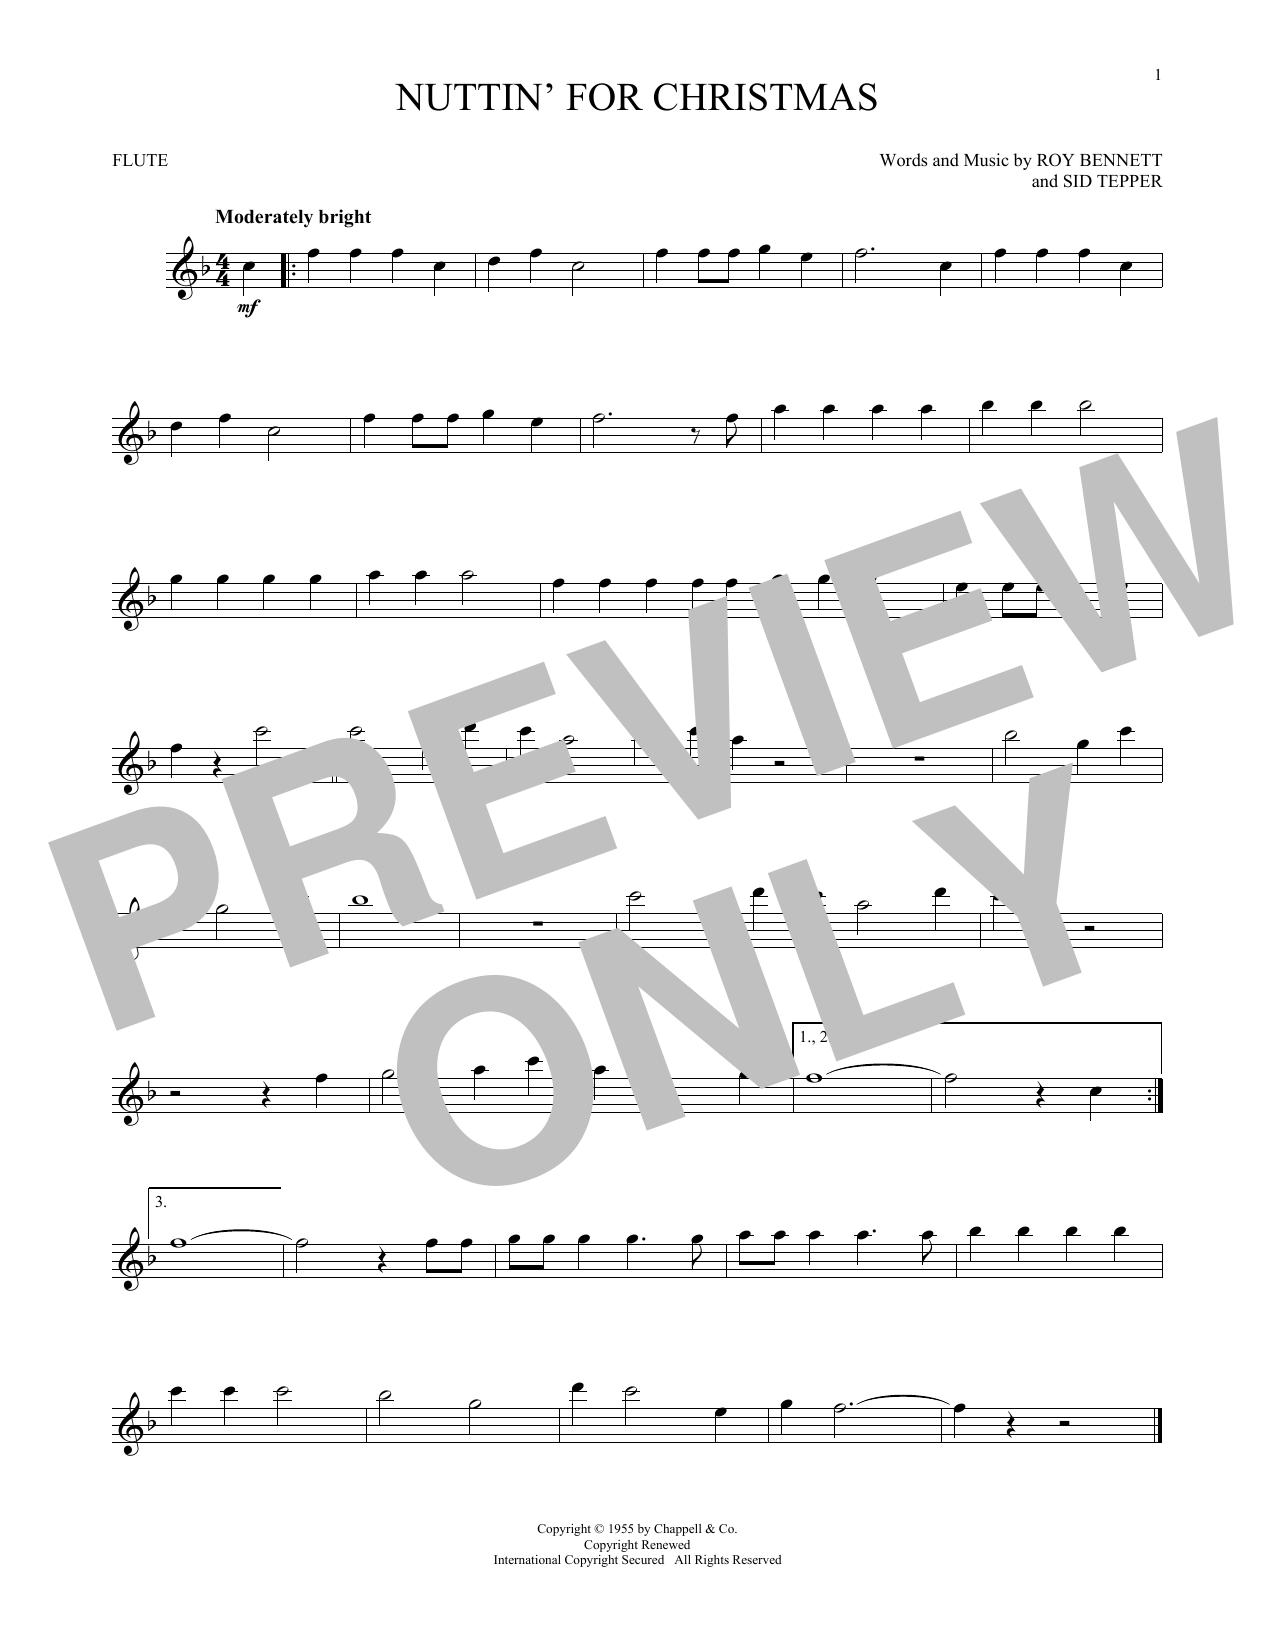 Nuttin' For Christmas (Flute Solo)